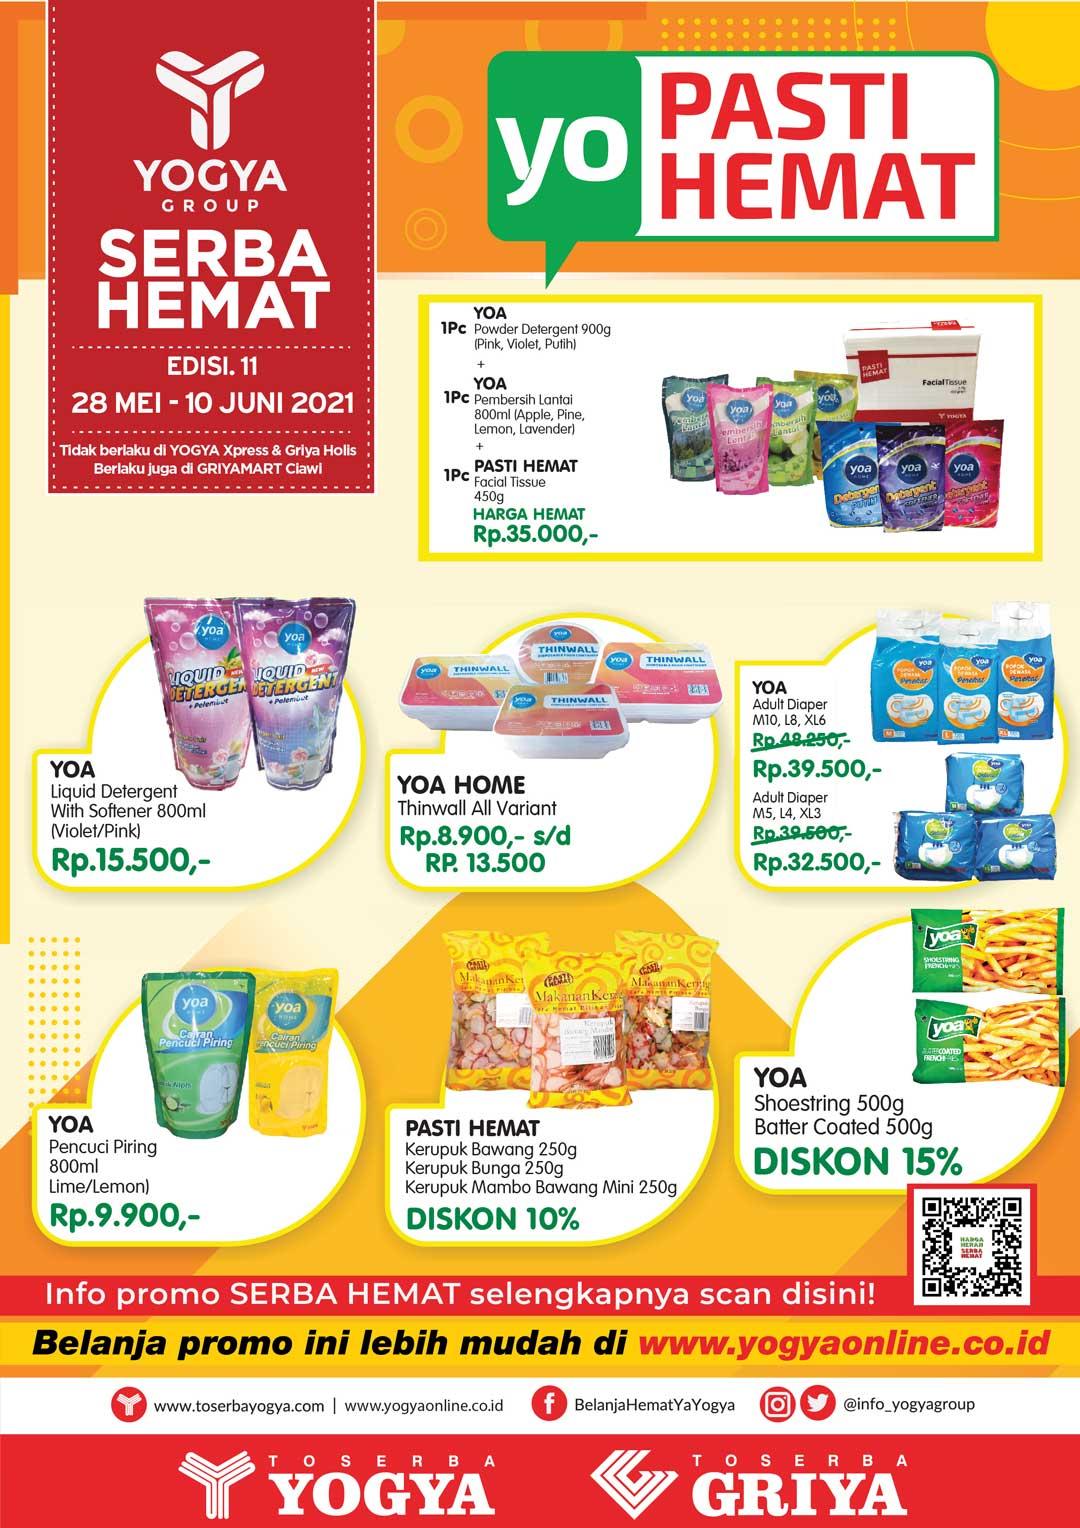 Katalog Toserba Yogya Promo SERBA HEMAT periode 11-24 Juni 2021